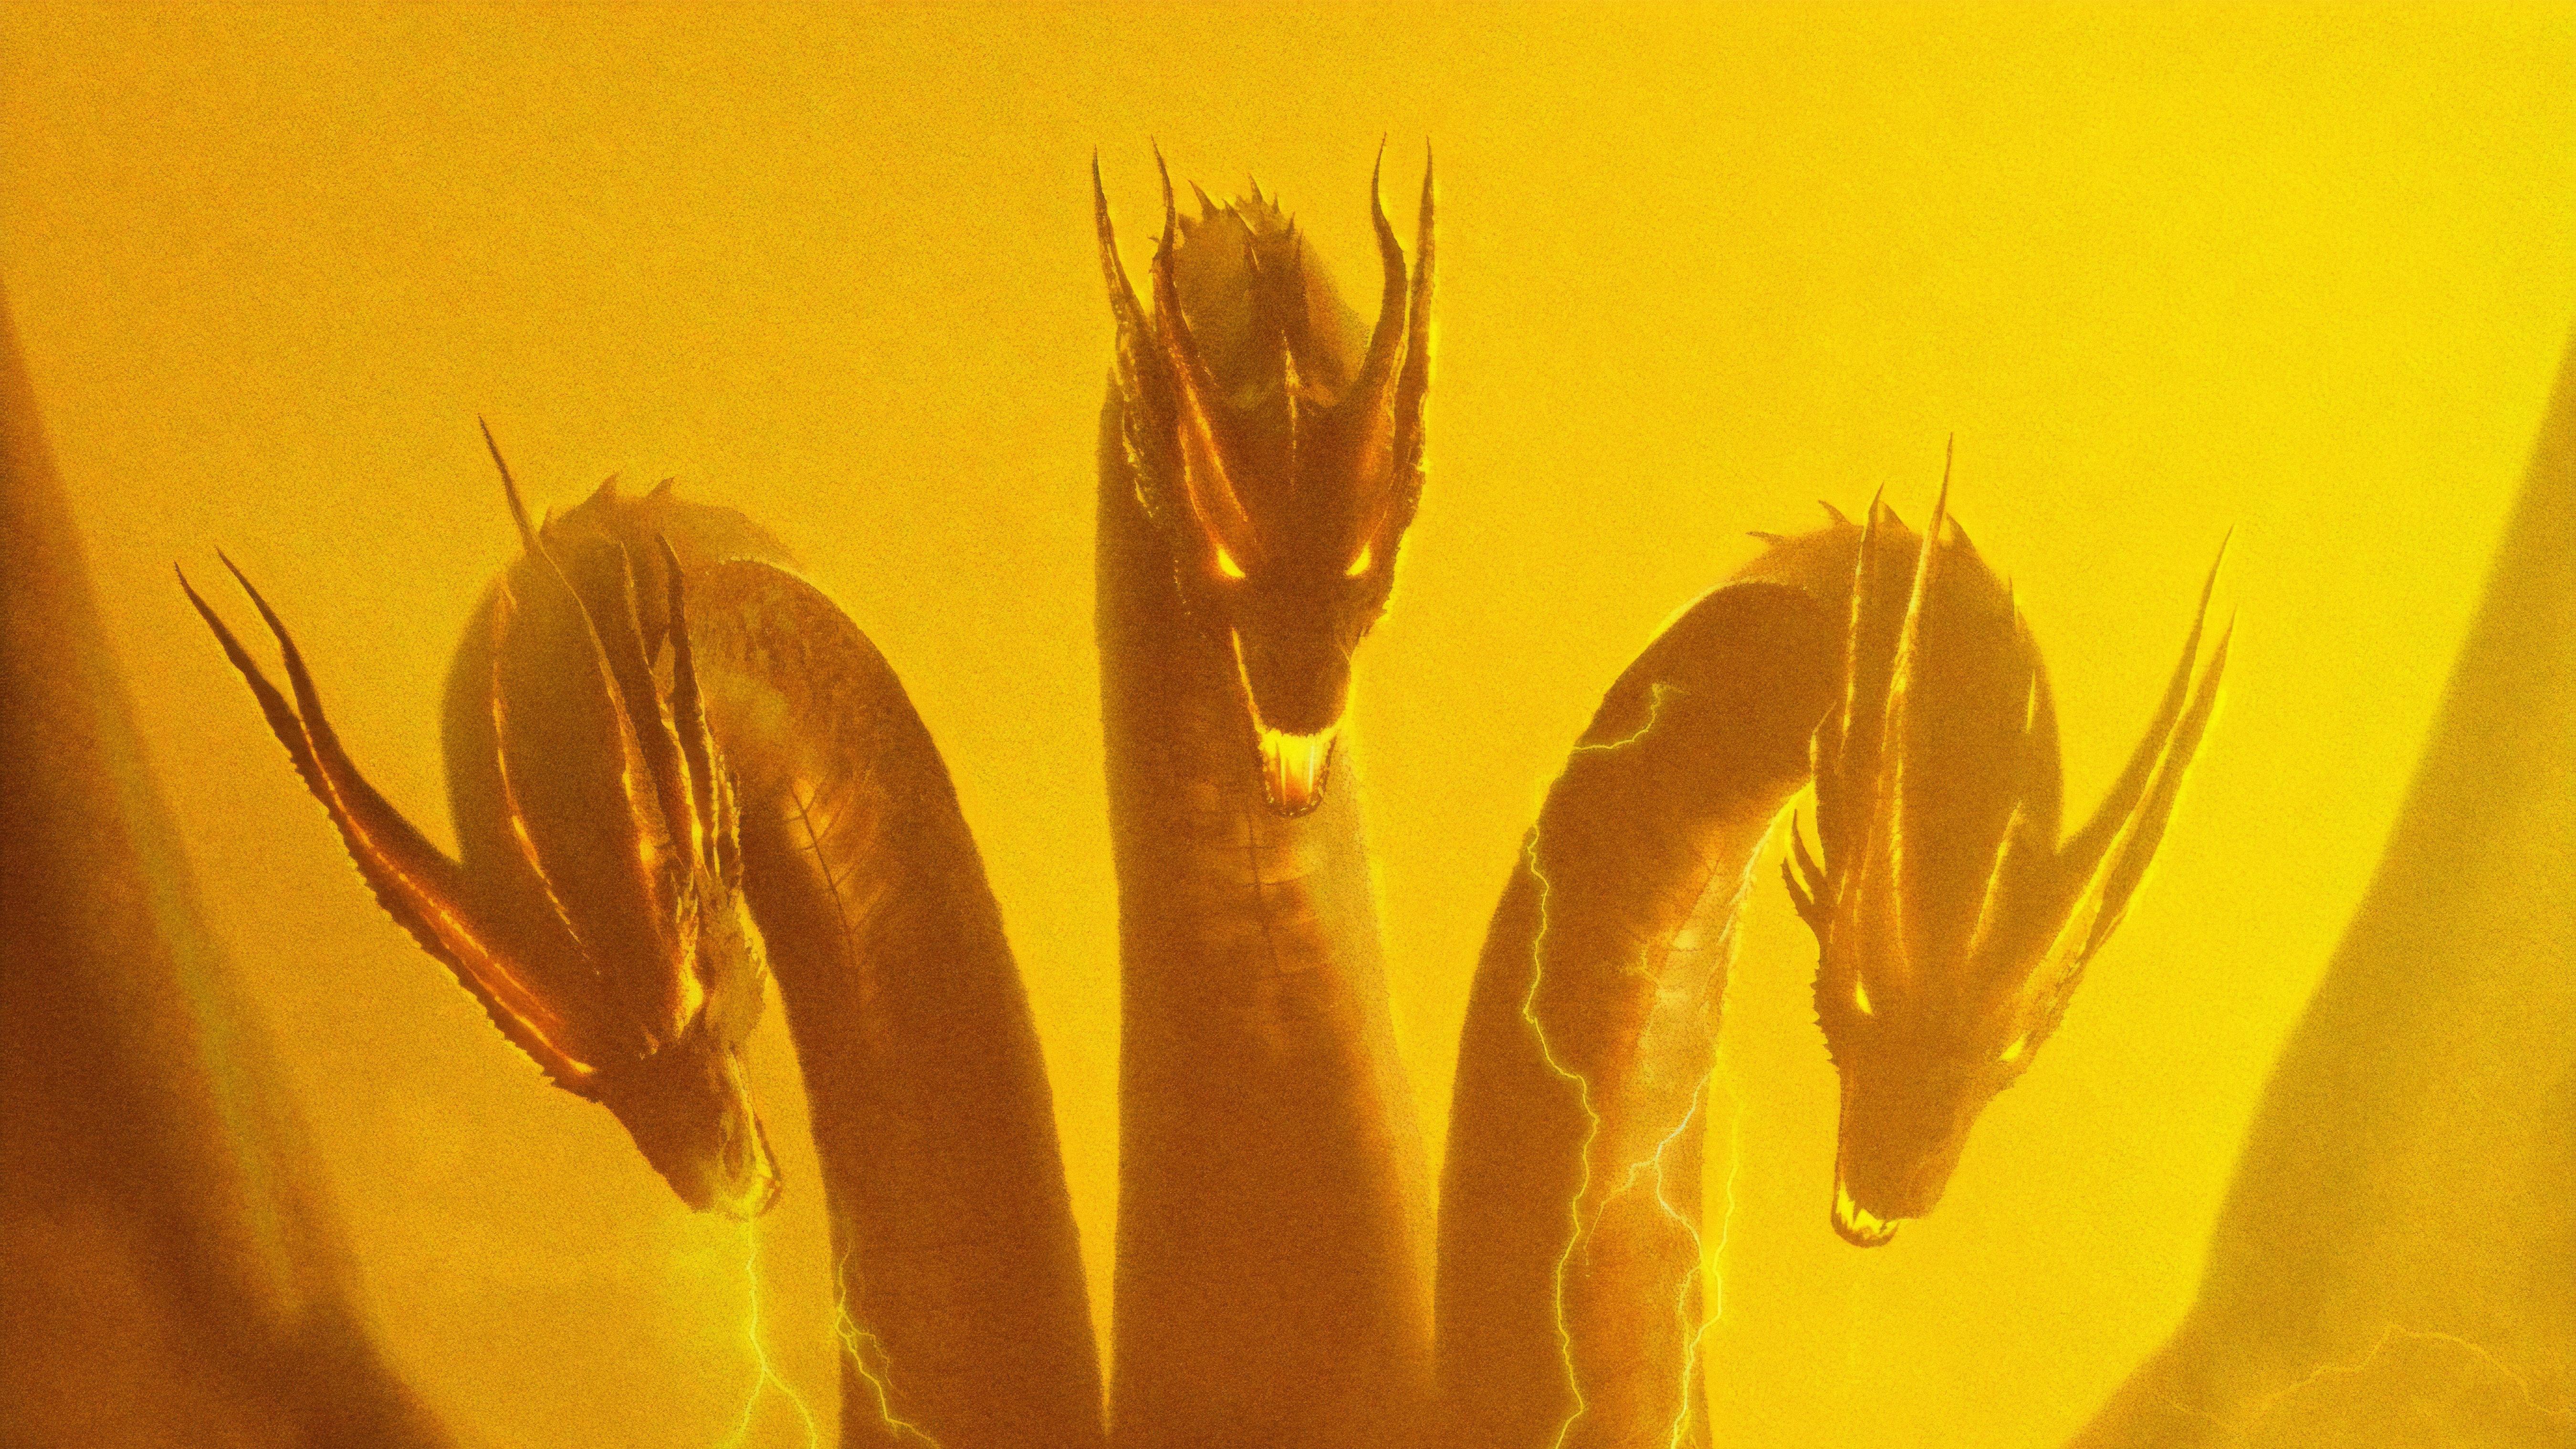 Ghidorah Godzilla King Of The Monsters 5k, HD Movies, 4k ...